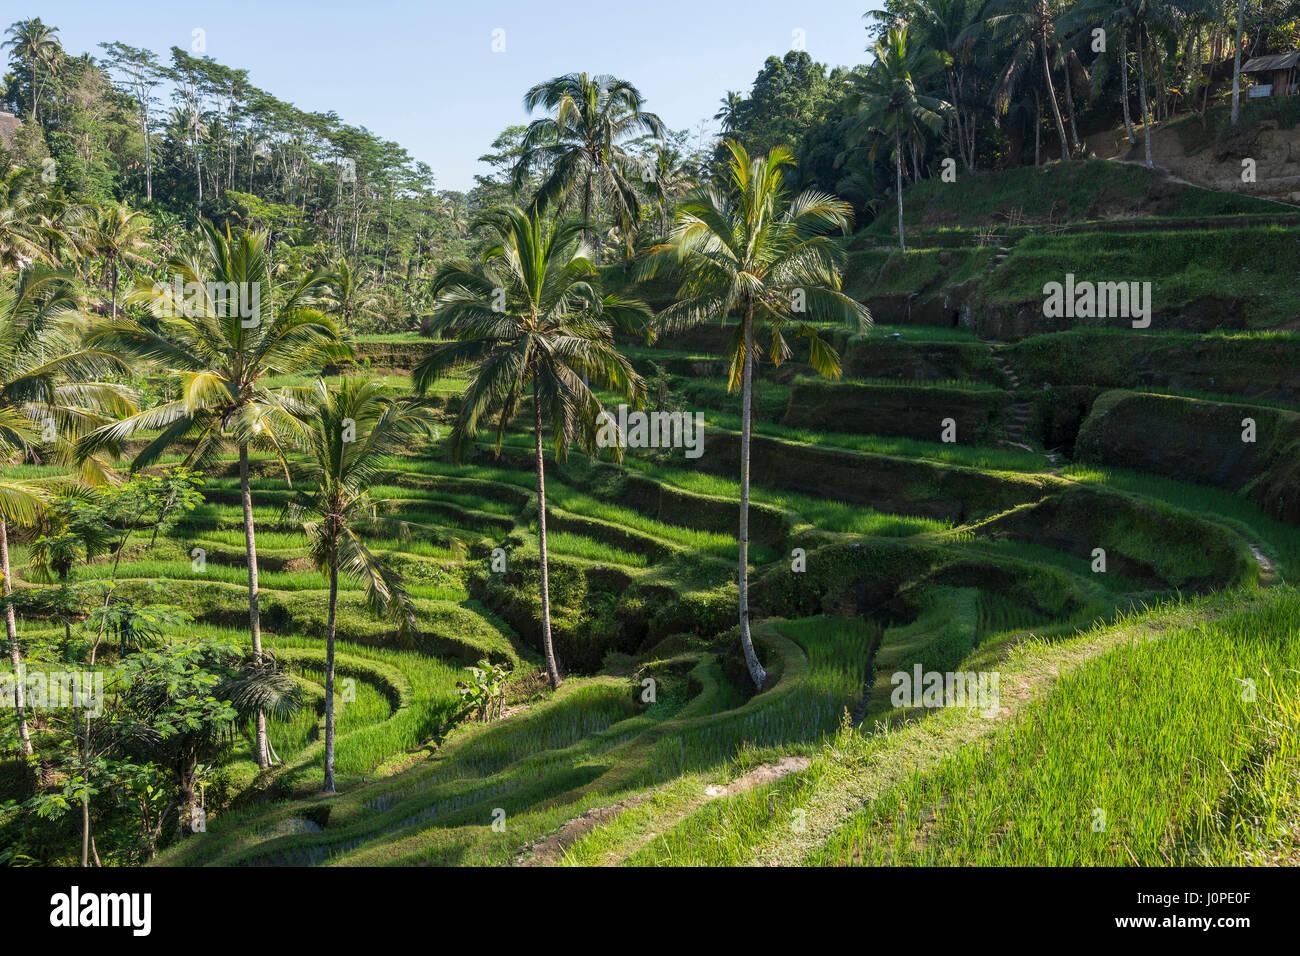 Terraced Rice Field, Bali, Indonesia - Stock Image